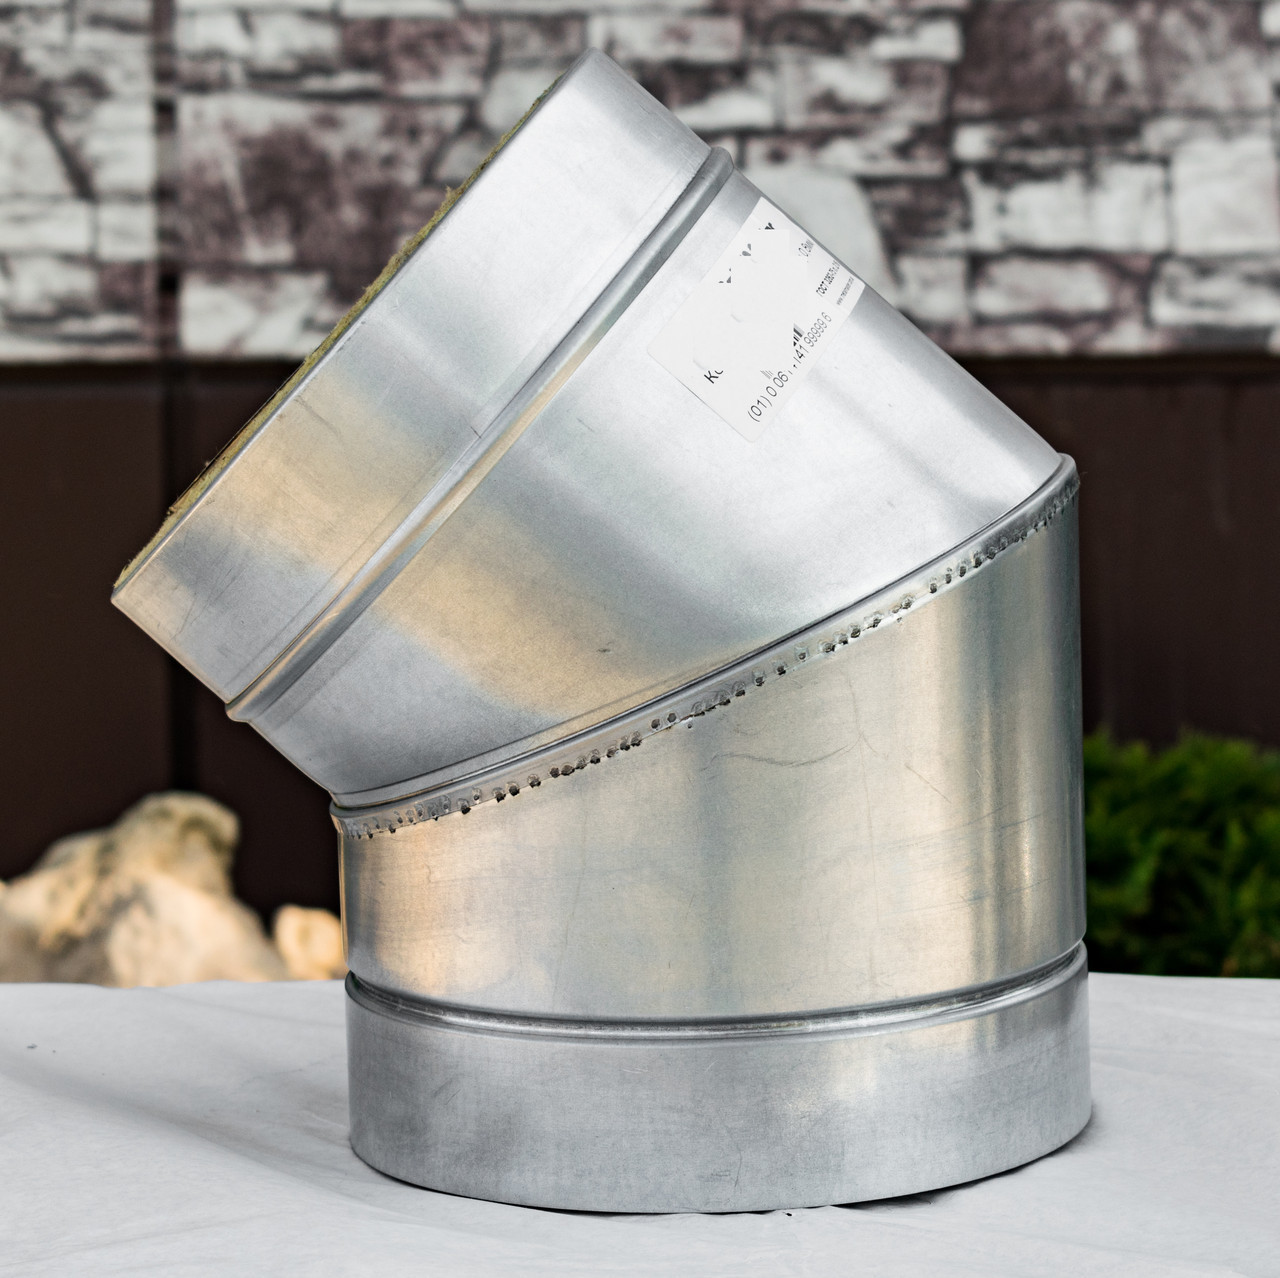 Колено дымохода 45° нерж/оц 1 мм 160/220мм